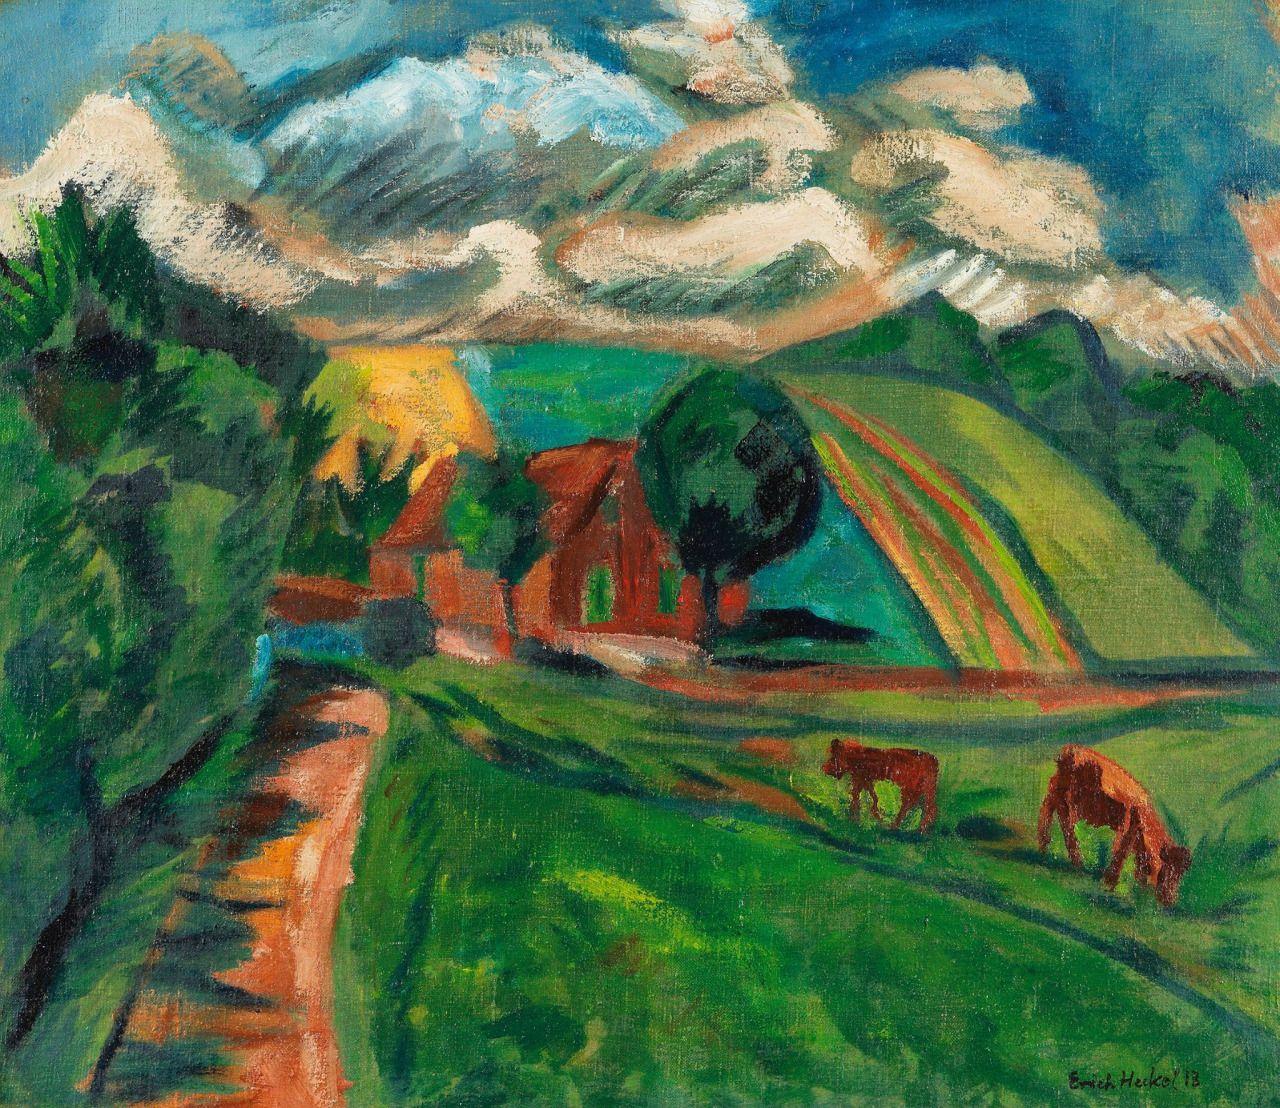 Erich Heckel (1883-1970) Hügellandschaft, 1913